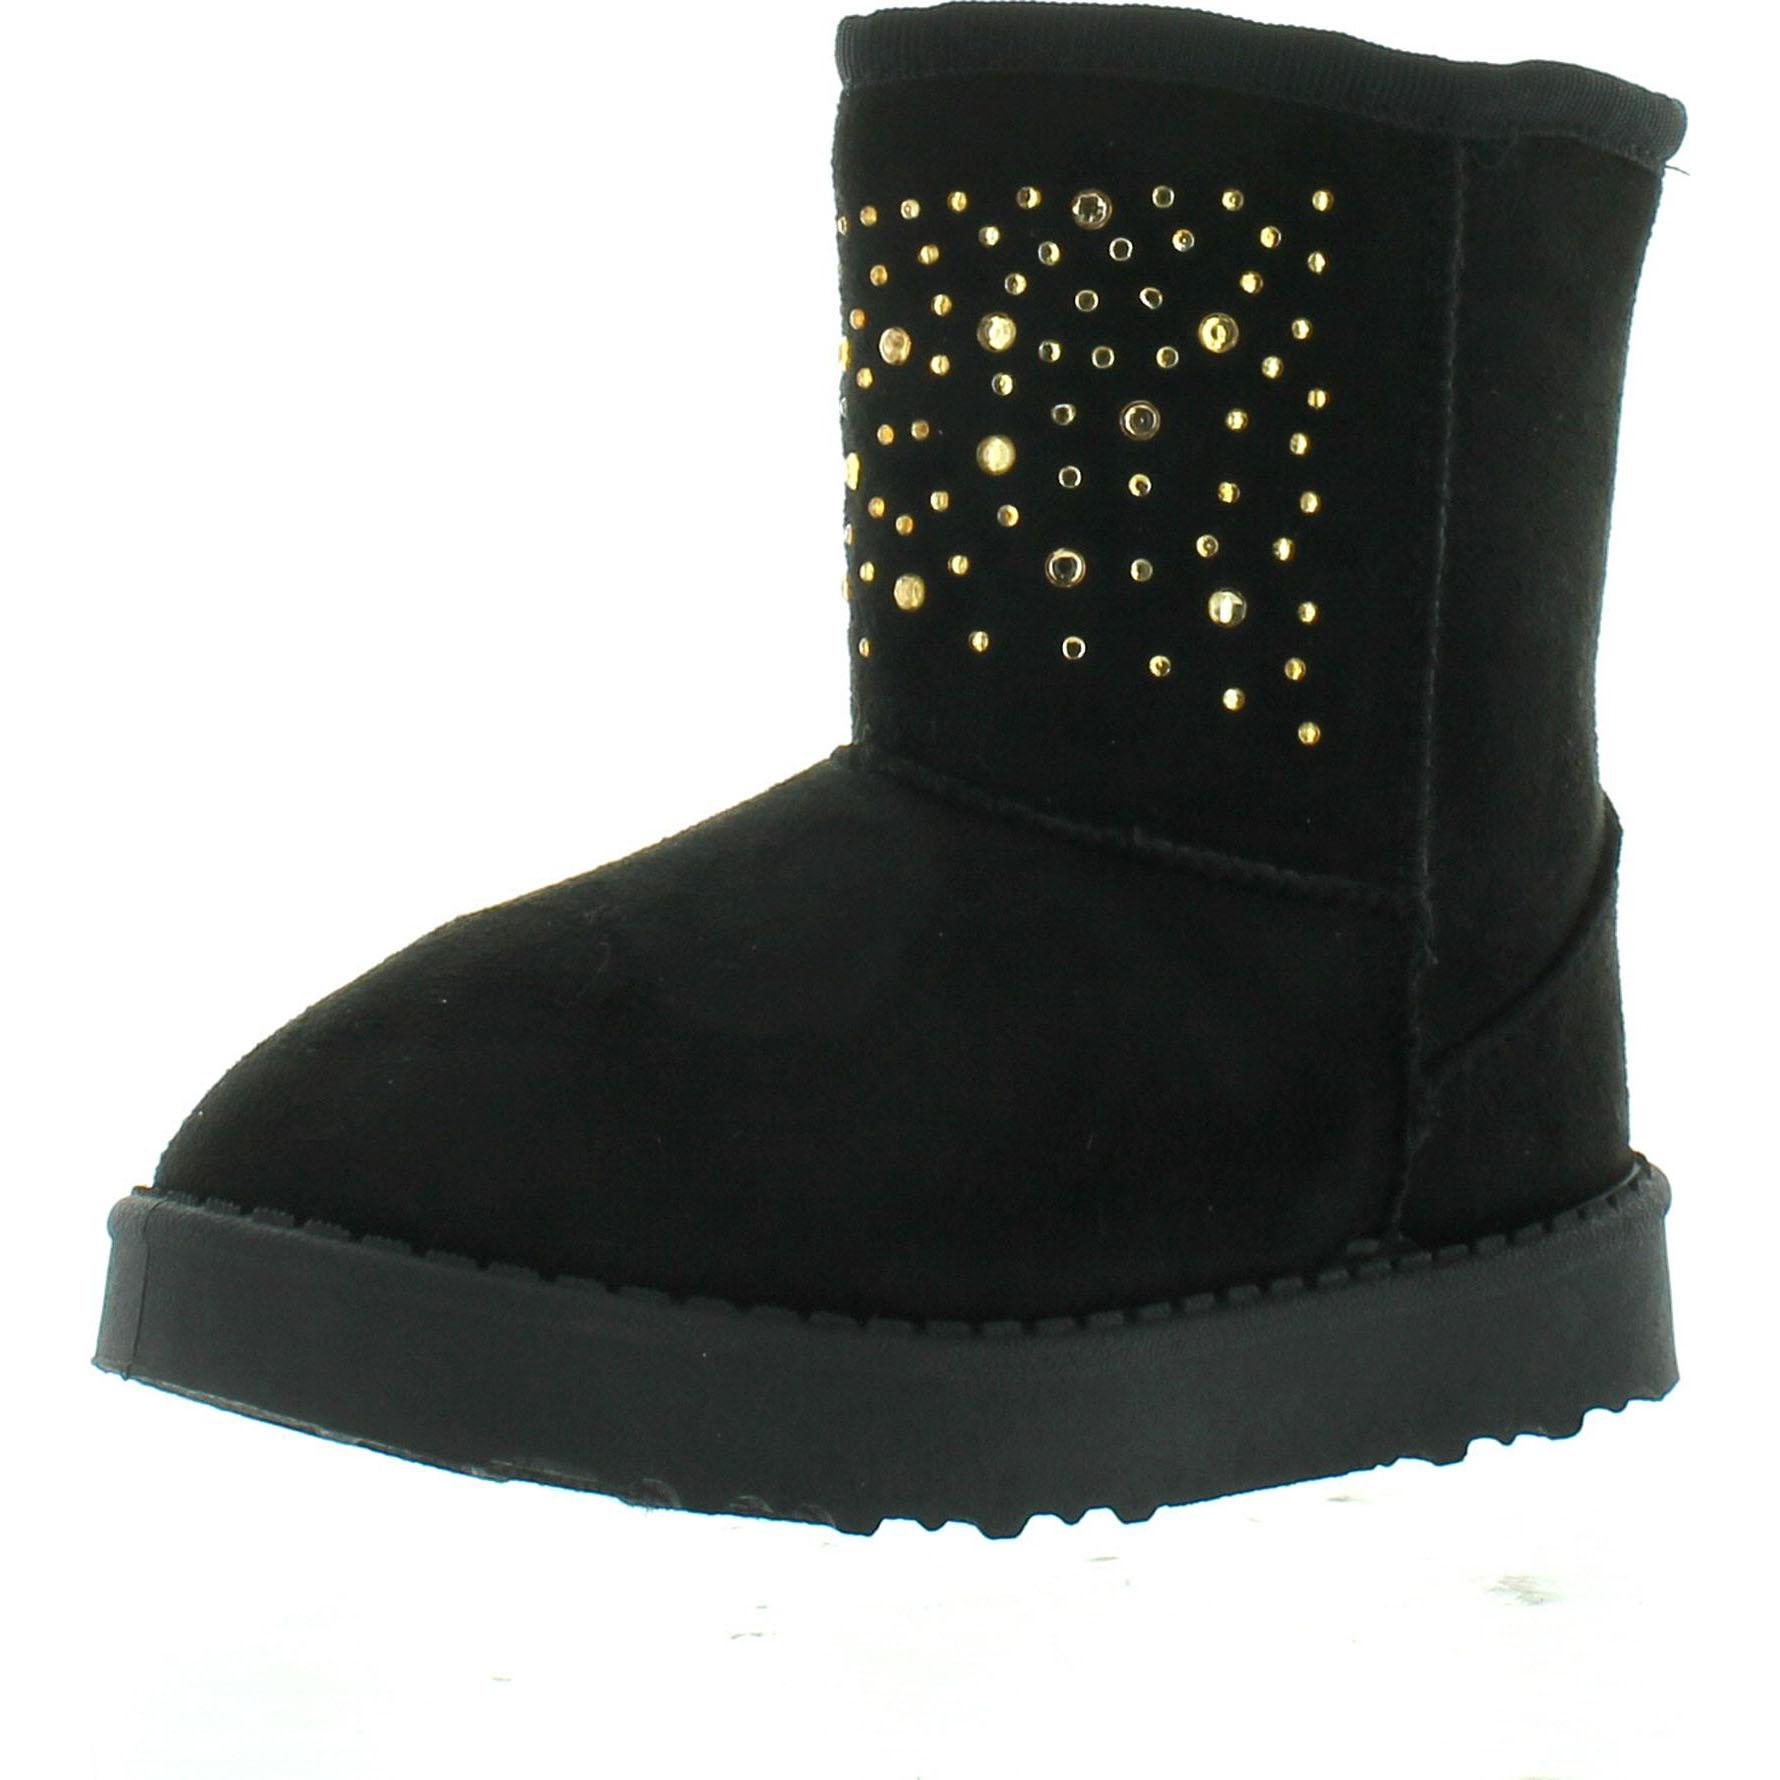 Coco Jumbo Black Patent Jane Boots Big Girls Size 4.5-7 Y